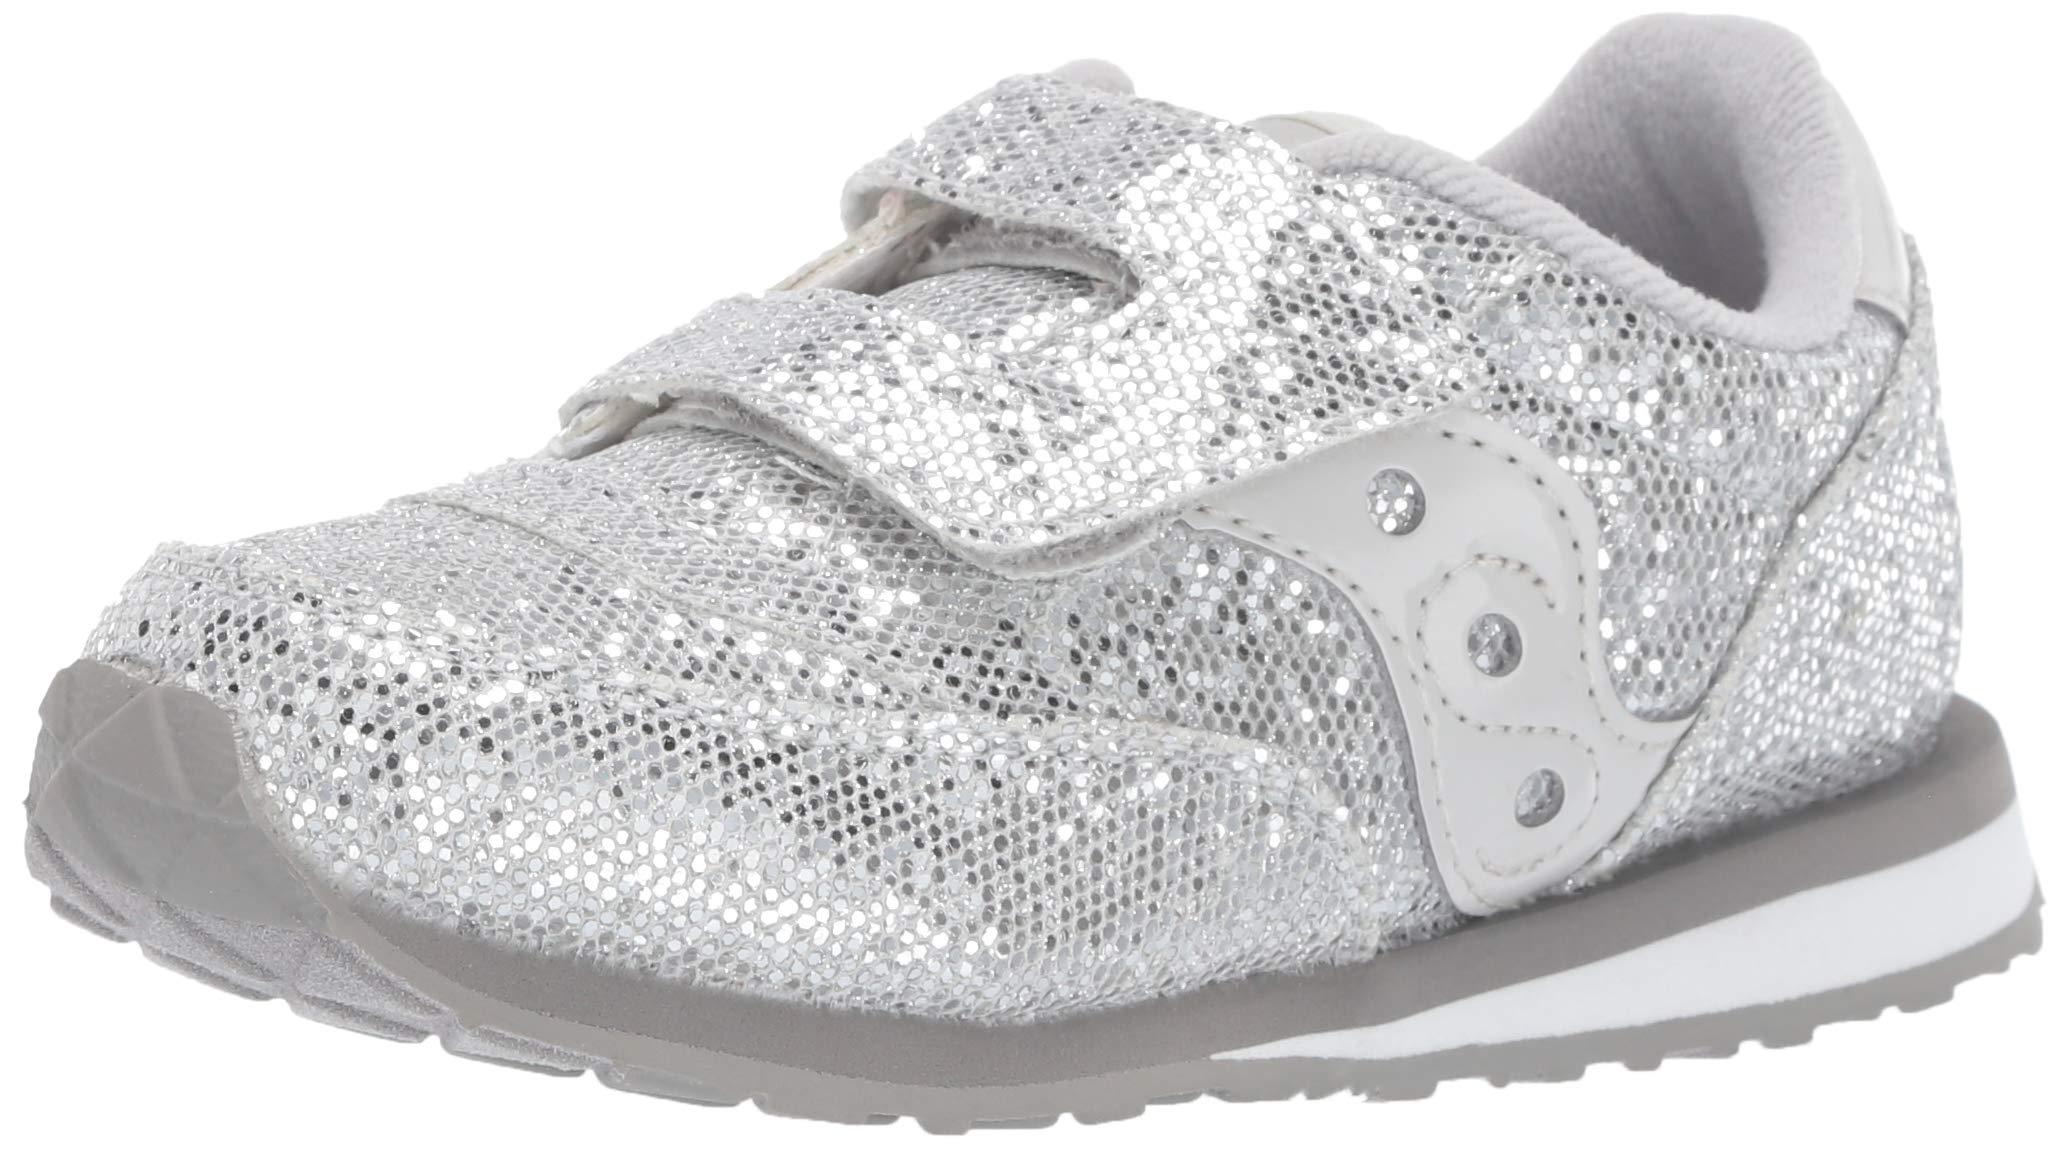 Saucony Girls' Baby Jazz HL Sneaker Silver/Sparkle 040 Medium US Toddler